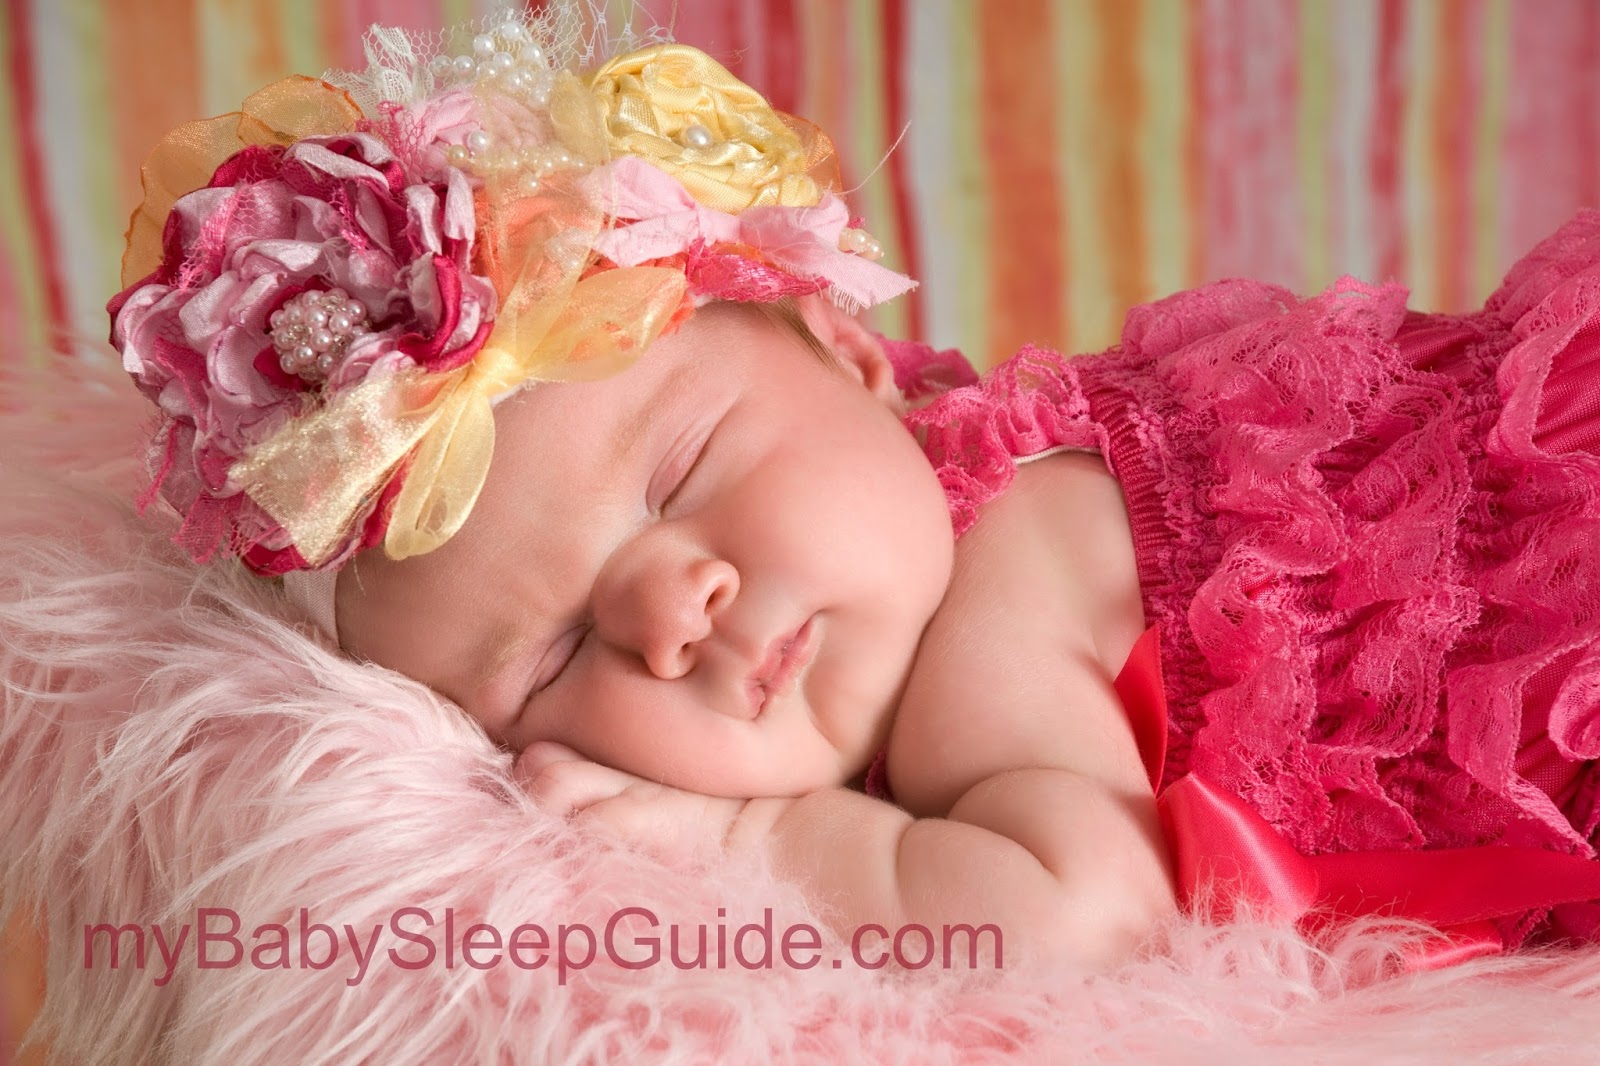 Newborn Sample Schedules ~ My Baby Sleep Guide | Your sleep problems